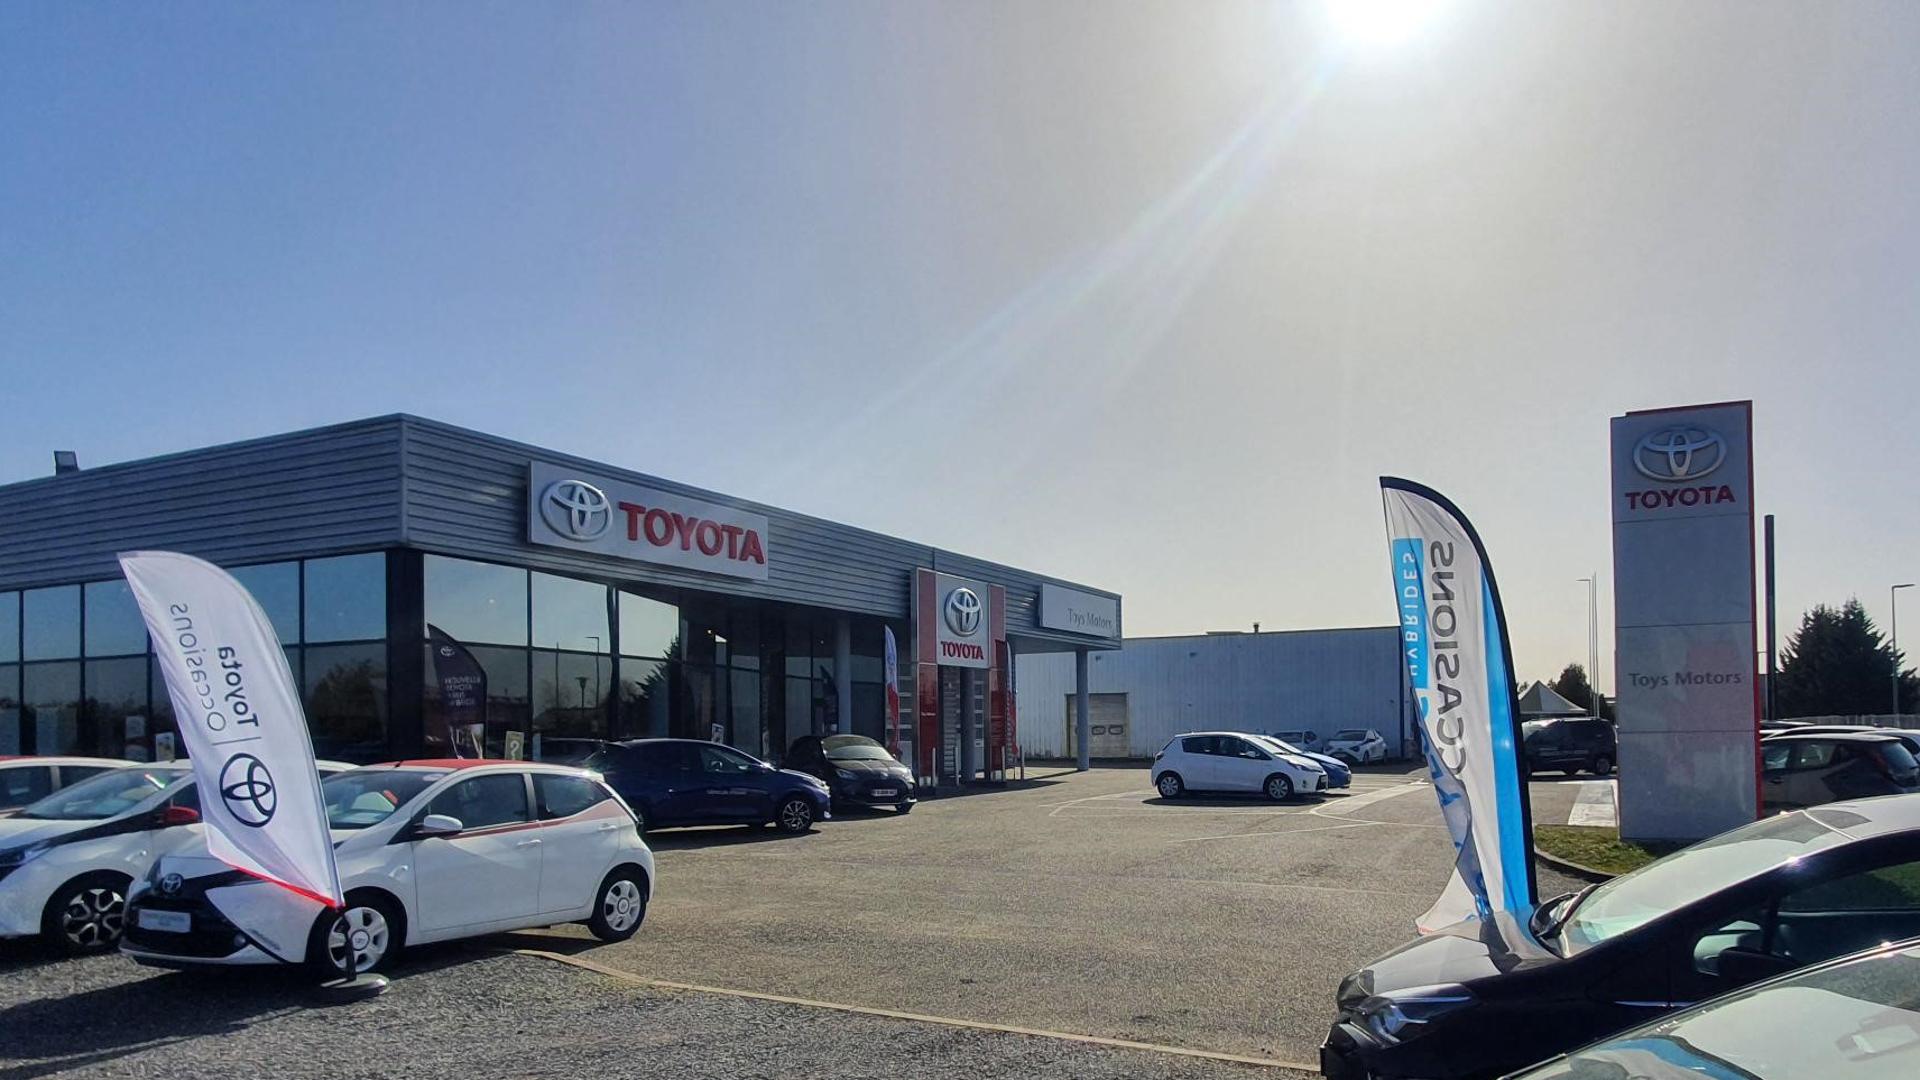 Toyota - Toys Motors - Sarrebourg